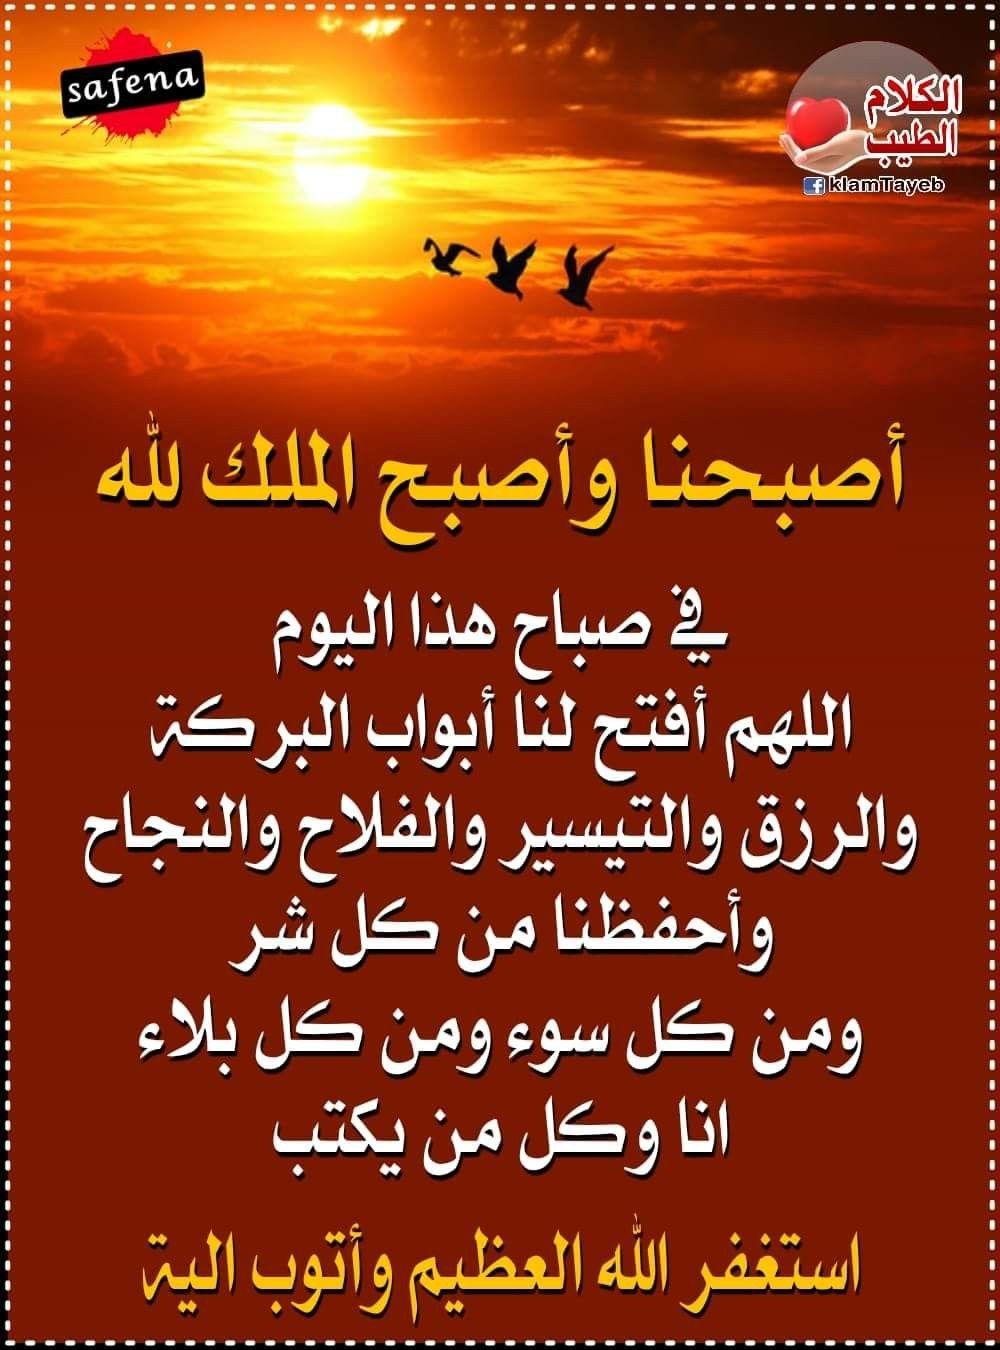 استغفر الله العظيم Arabic Calligraphy Poster Movie Posters